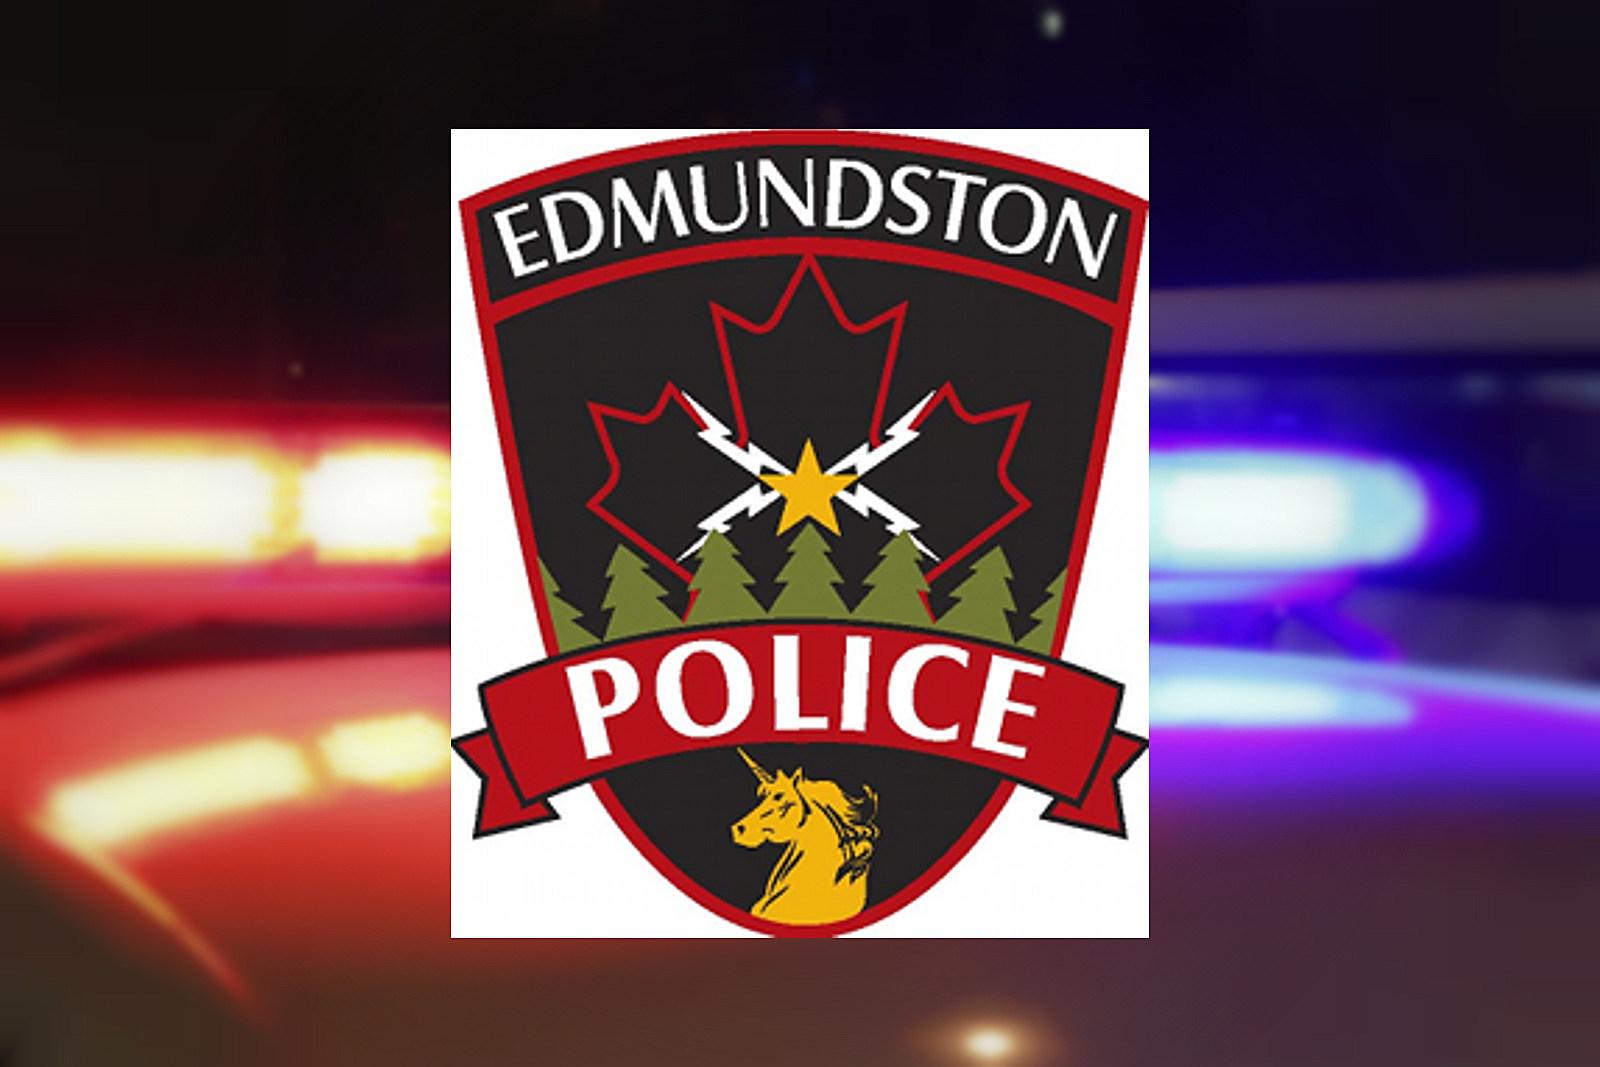 Dating edmundston